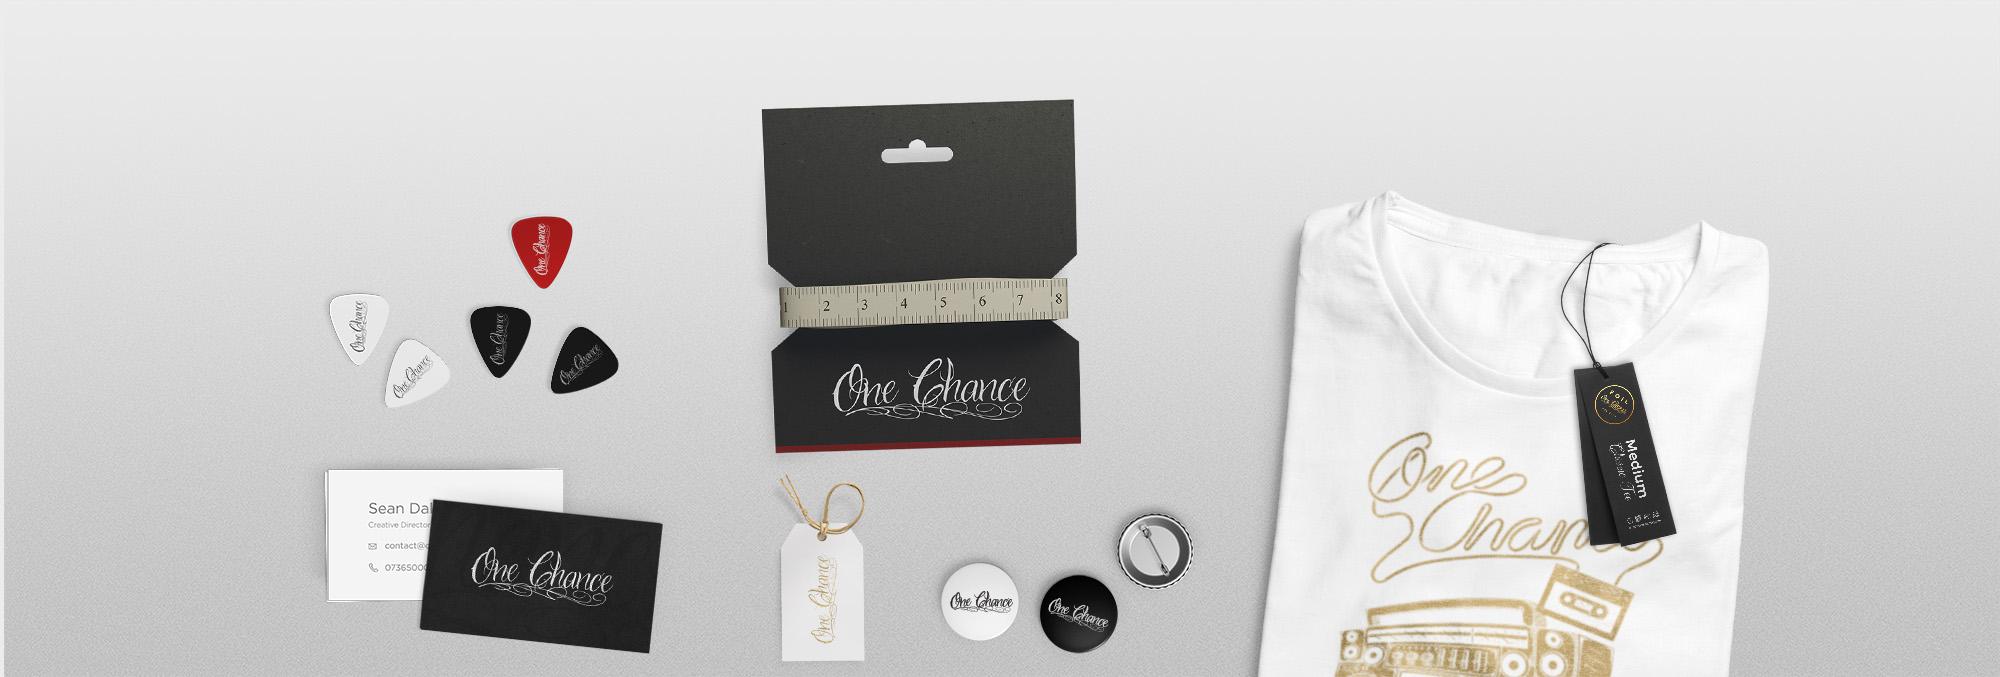 One Chance Branding Mockup